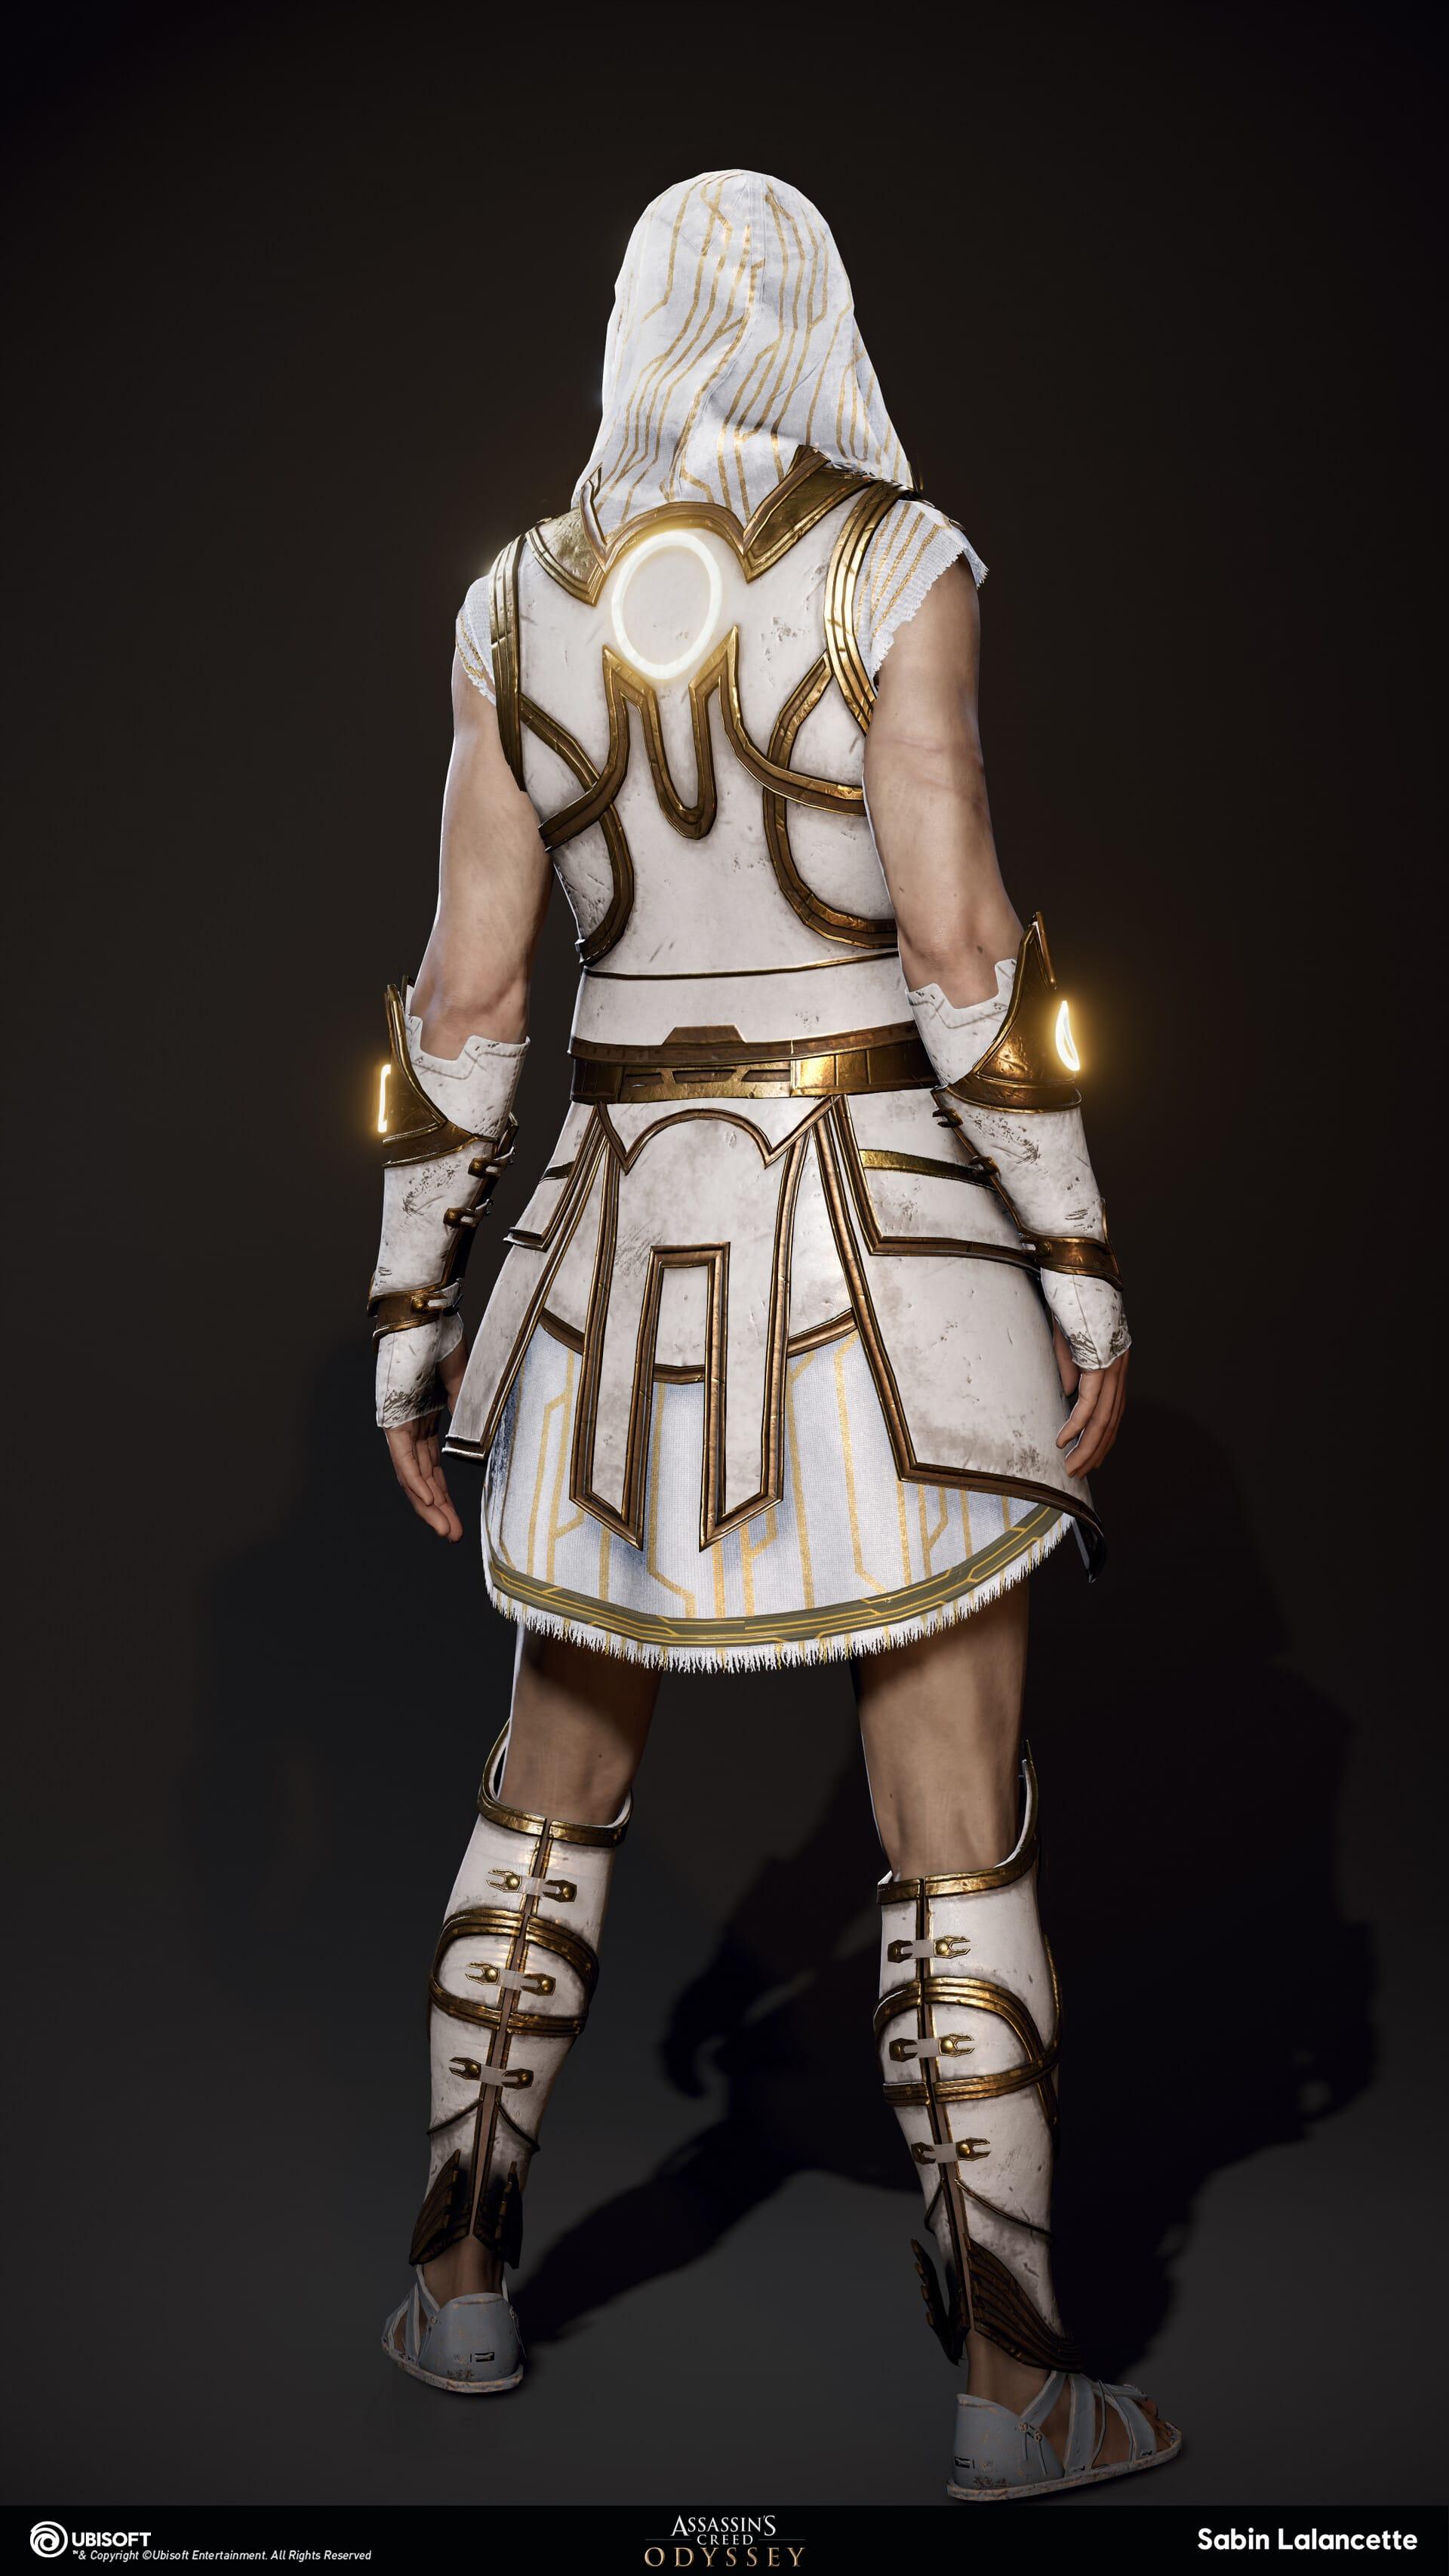 sabin-lalancette-artblast-fullsize-outfit-elysium-back-kassandra-slalancette